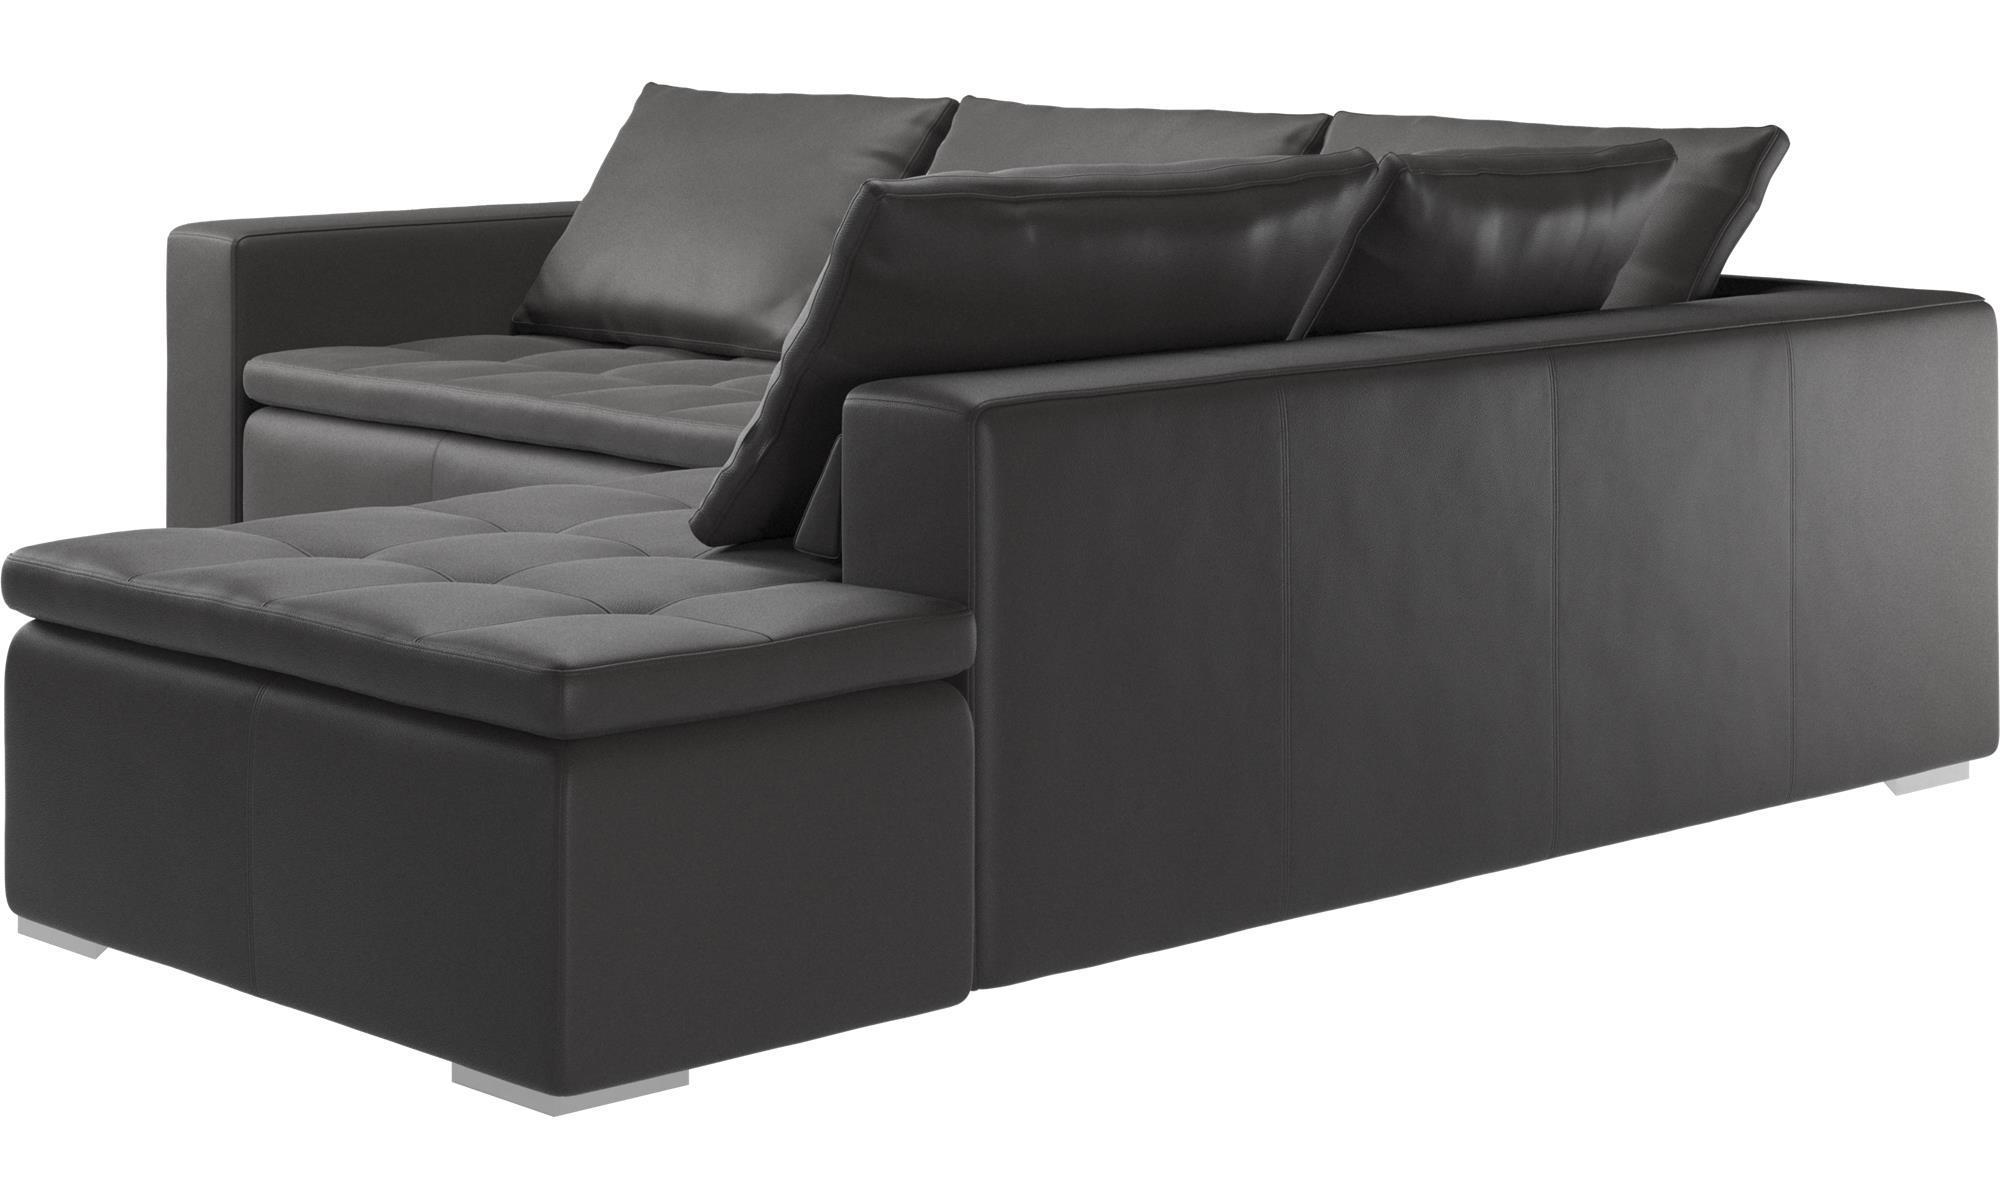 corner unit sofas south africa leather sofa sets on sale mezzo l with led lights genuine